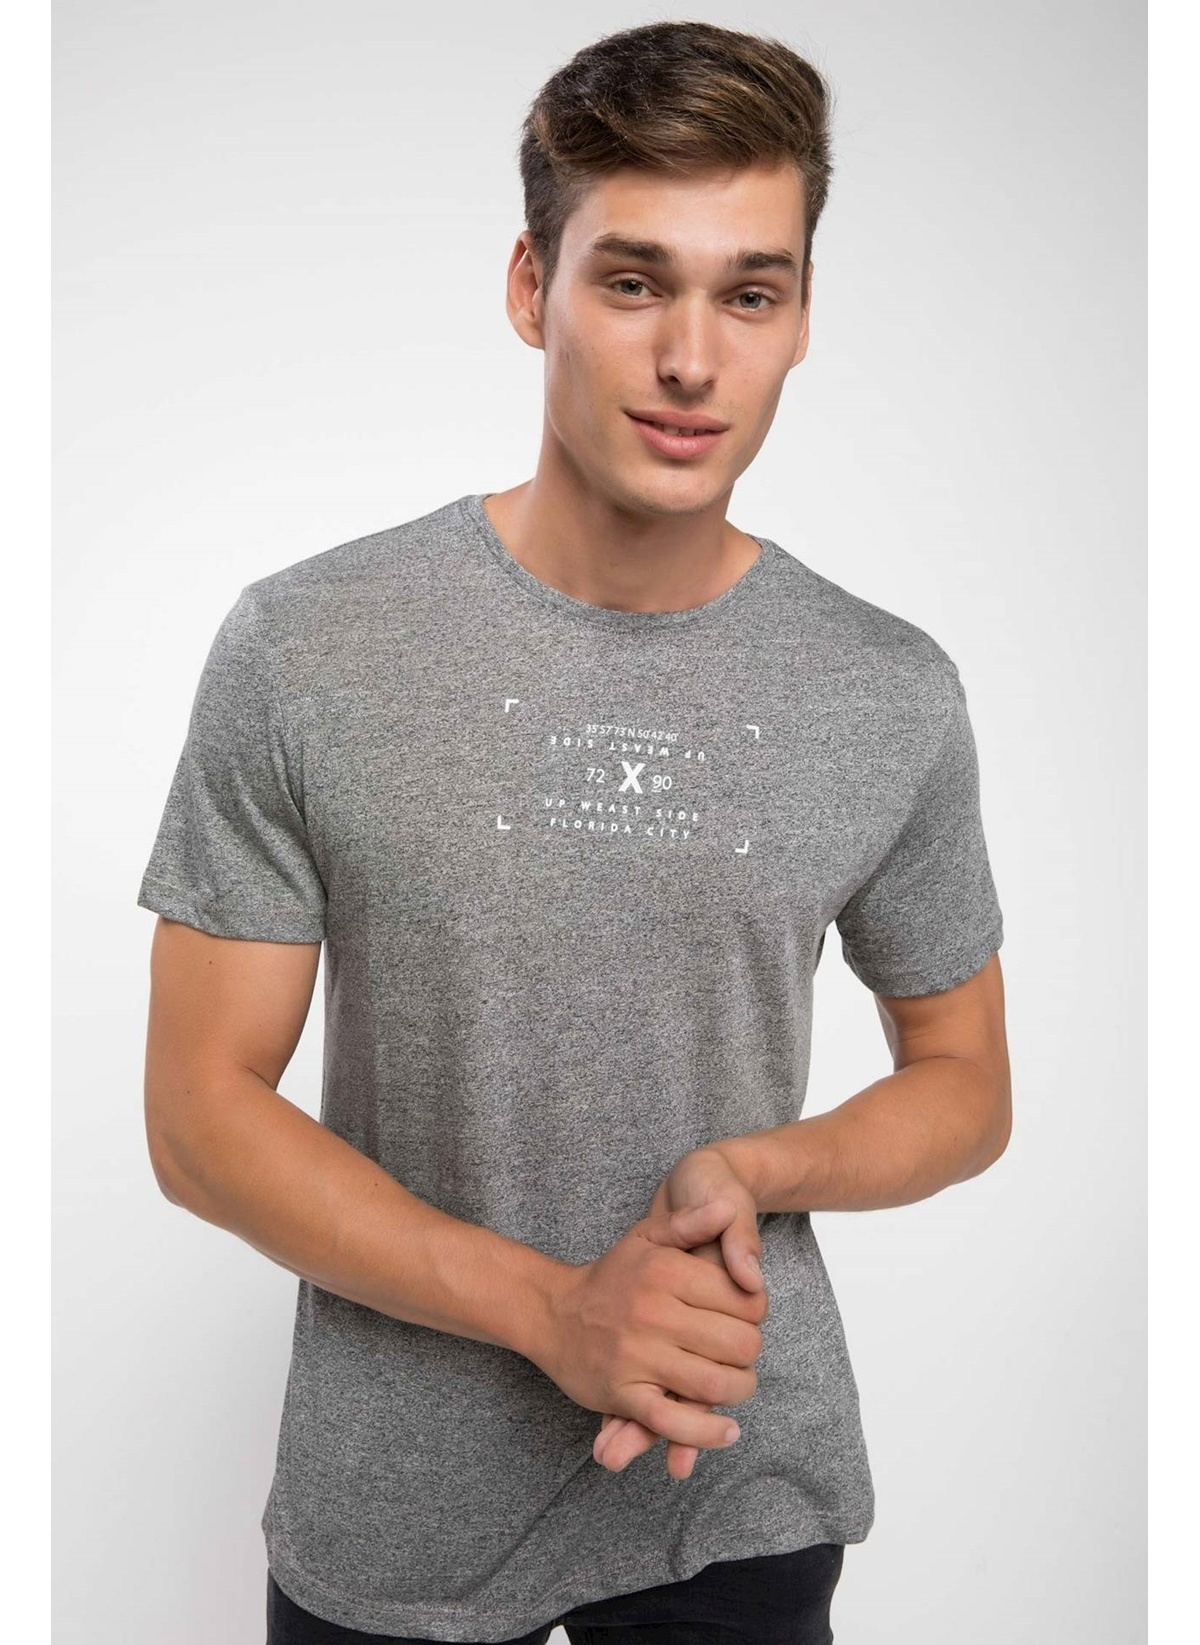 Defacto Mini Yazı Baskılı Slim Fit T-shirt K1109az18hsar144t-shirt – 29.99 TL